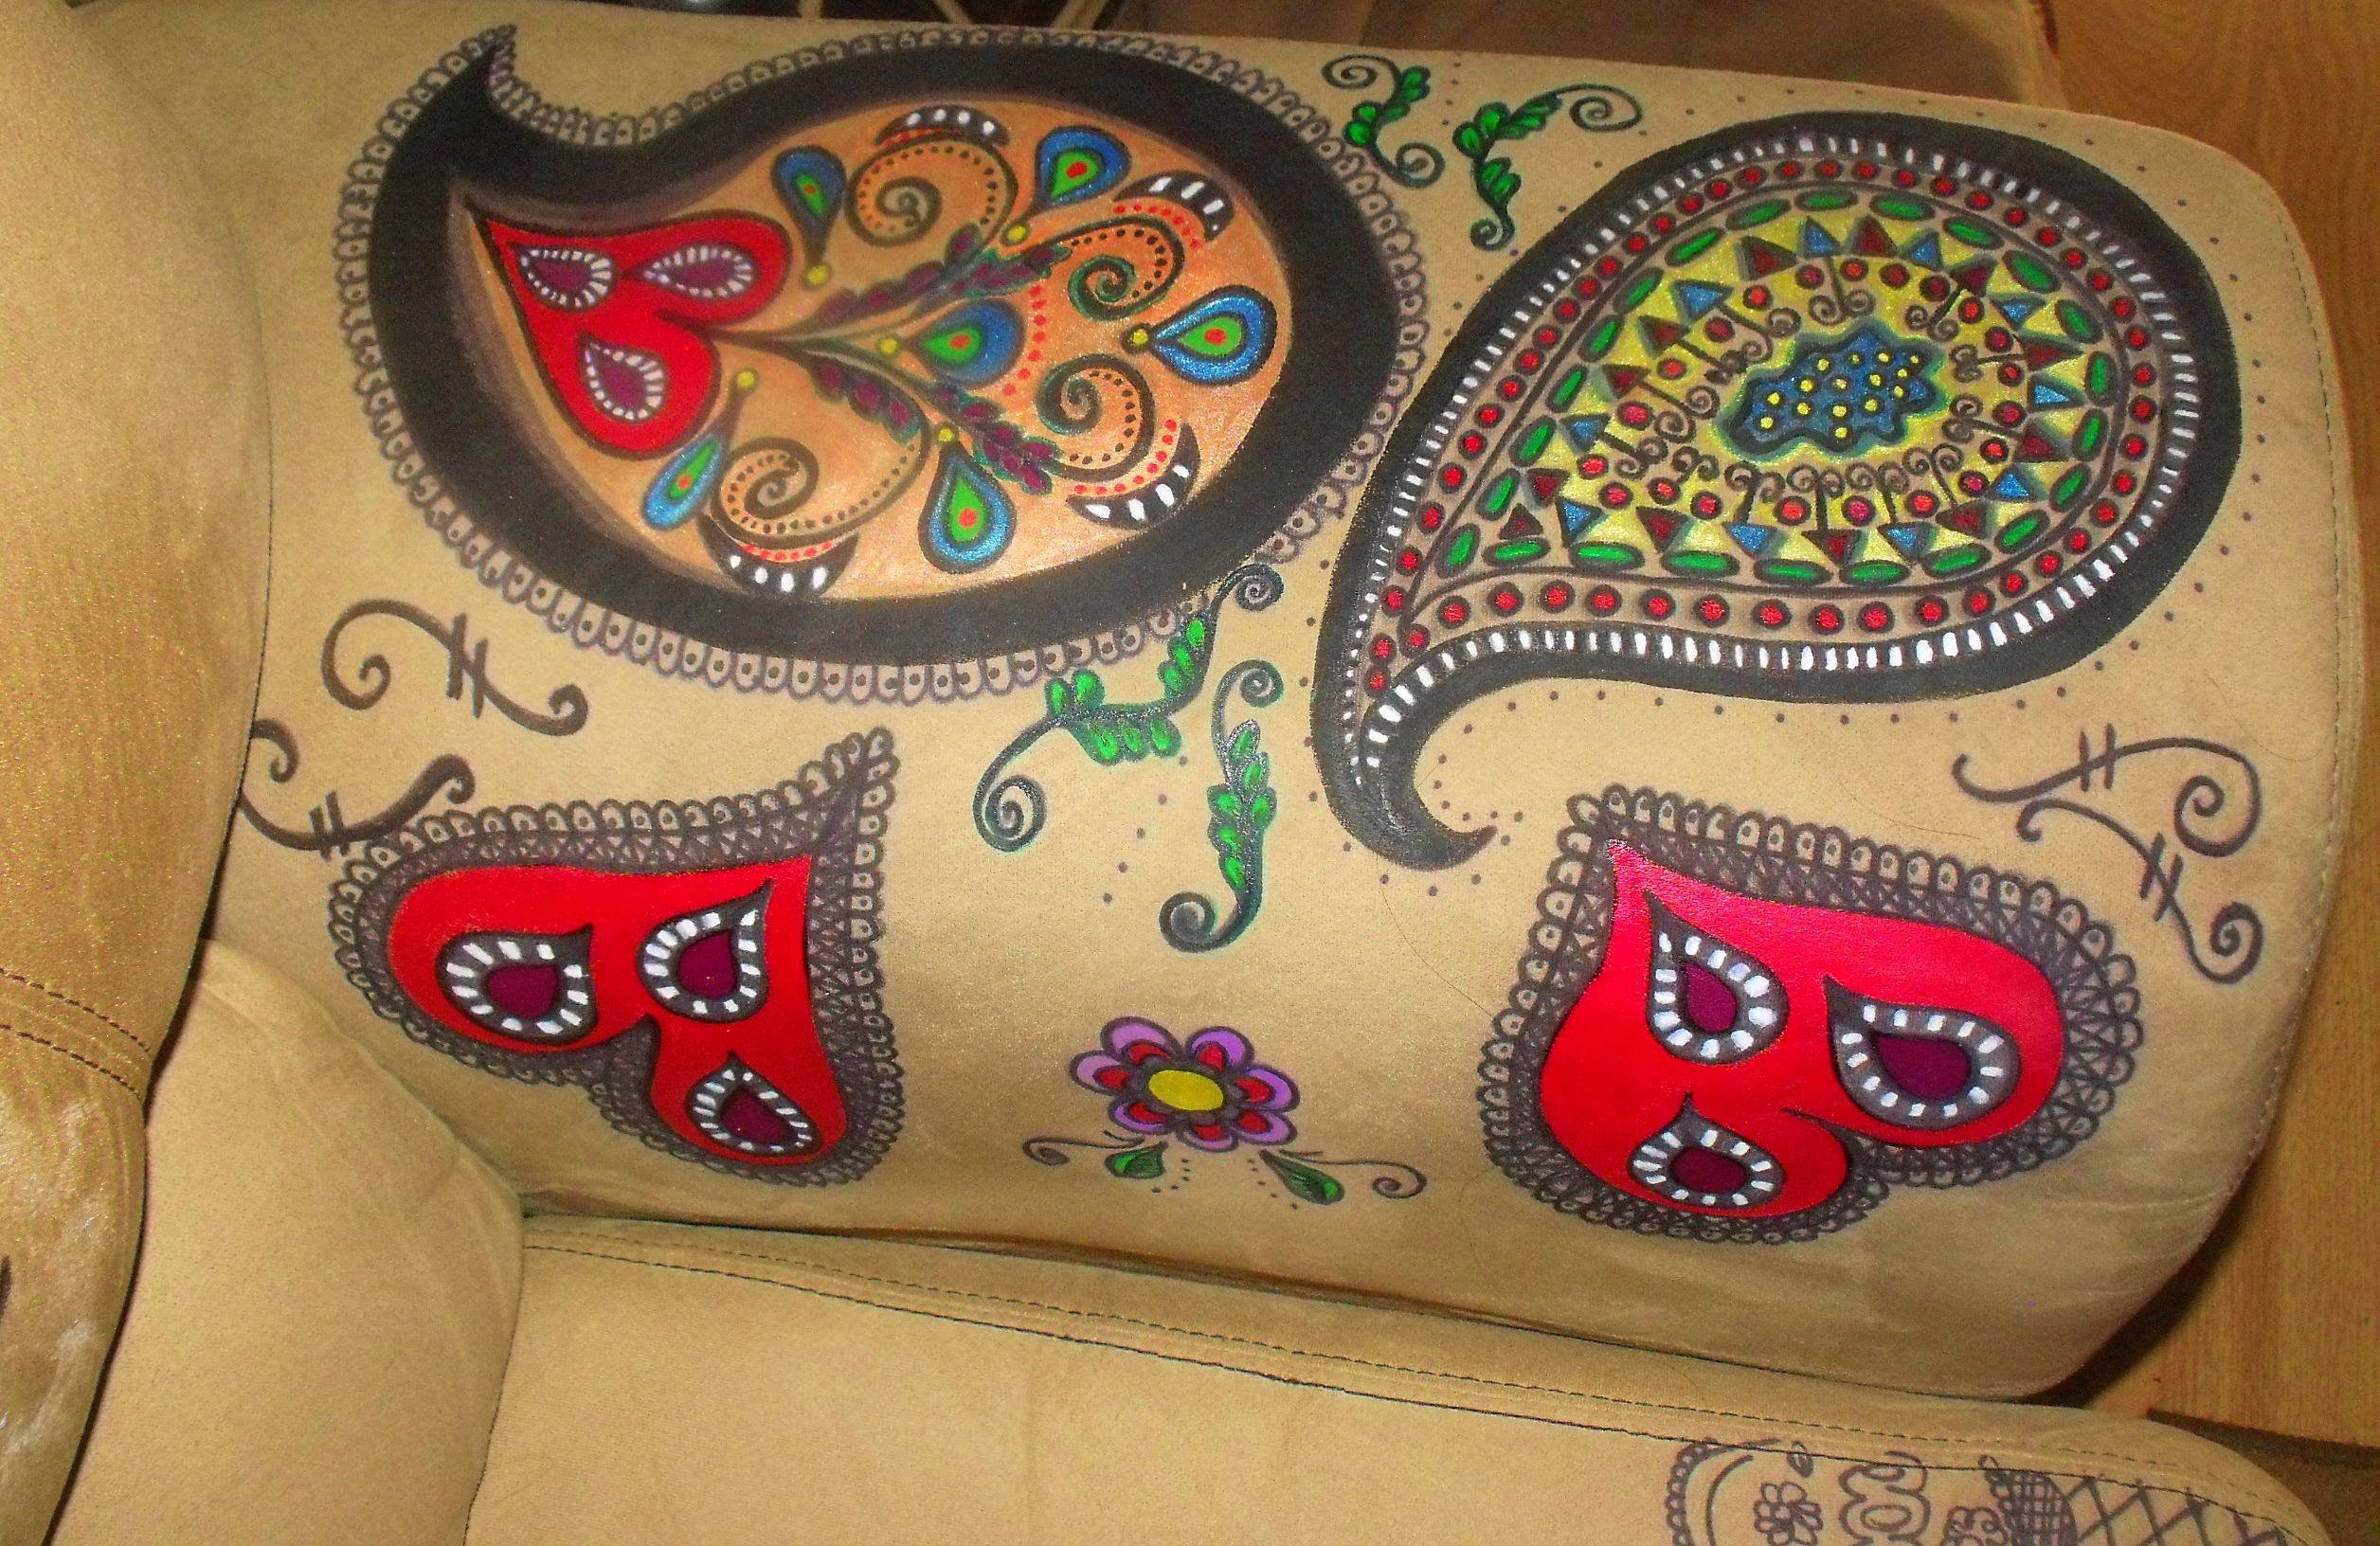 http://rosanamodugno.hubpages.com/hub/How-to-Tattoo-Your-Sofa